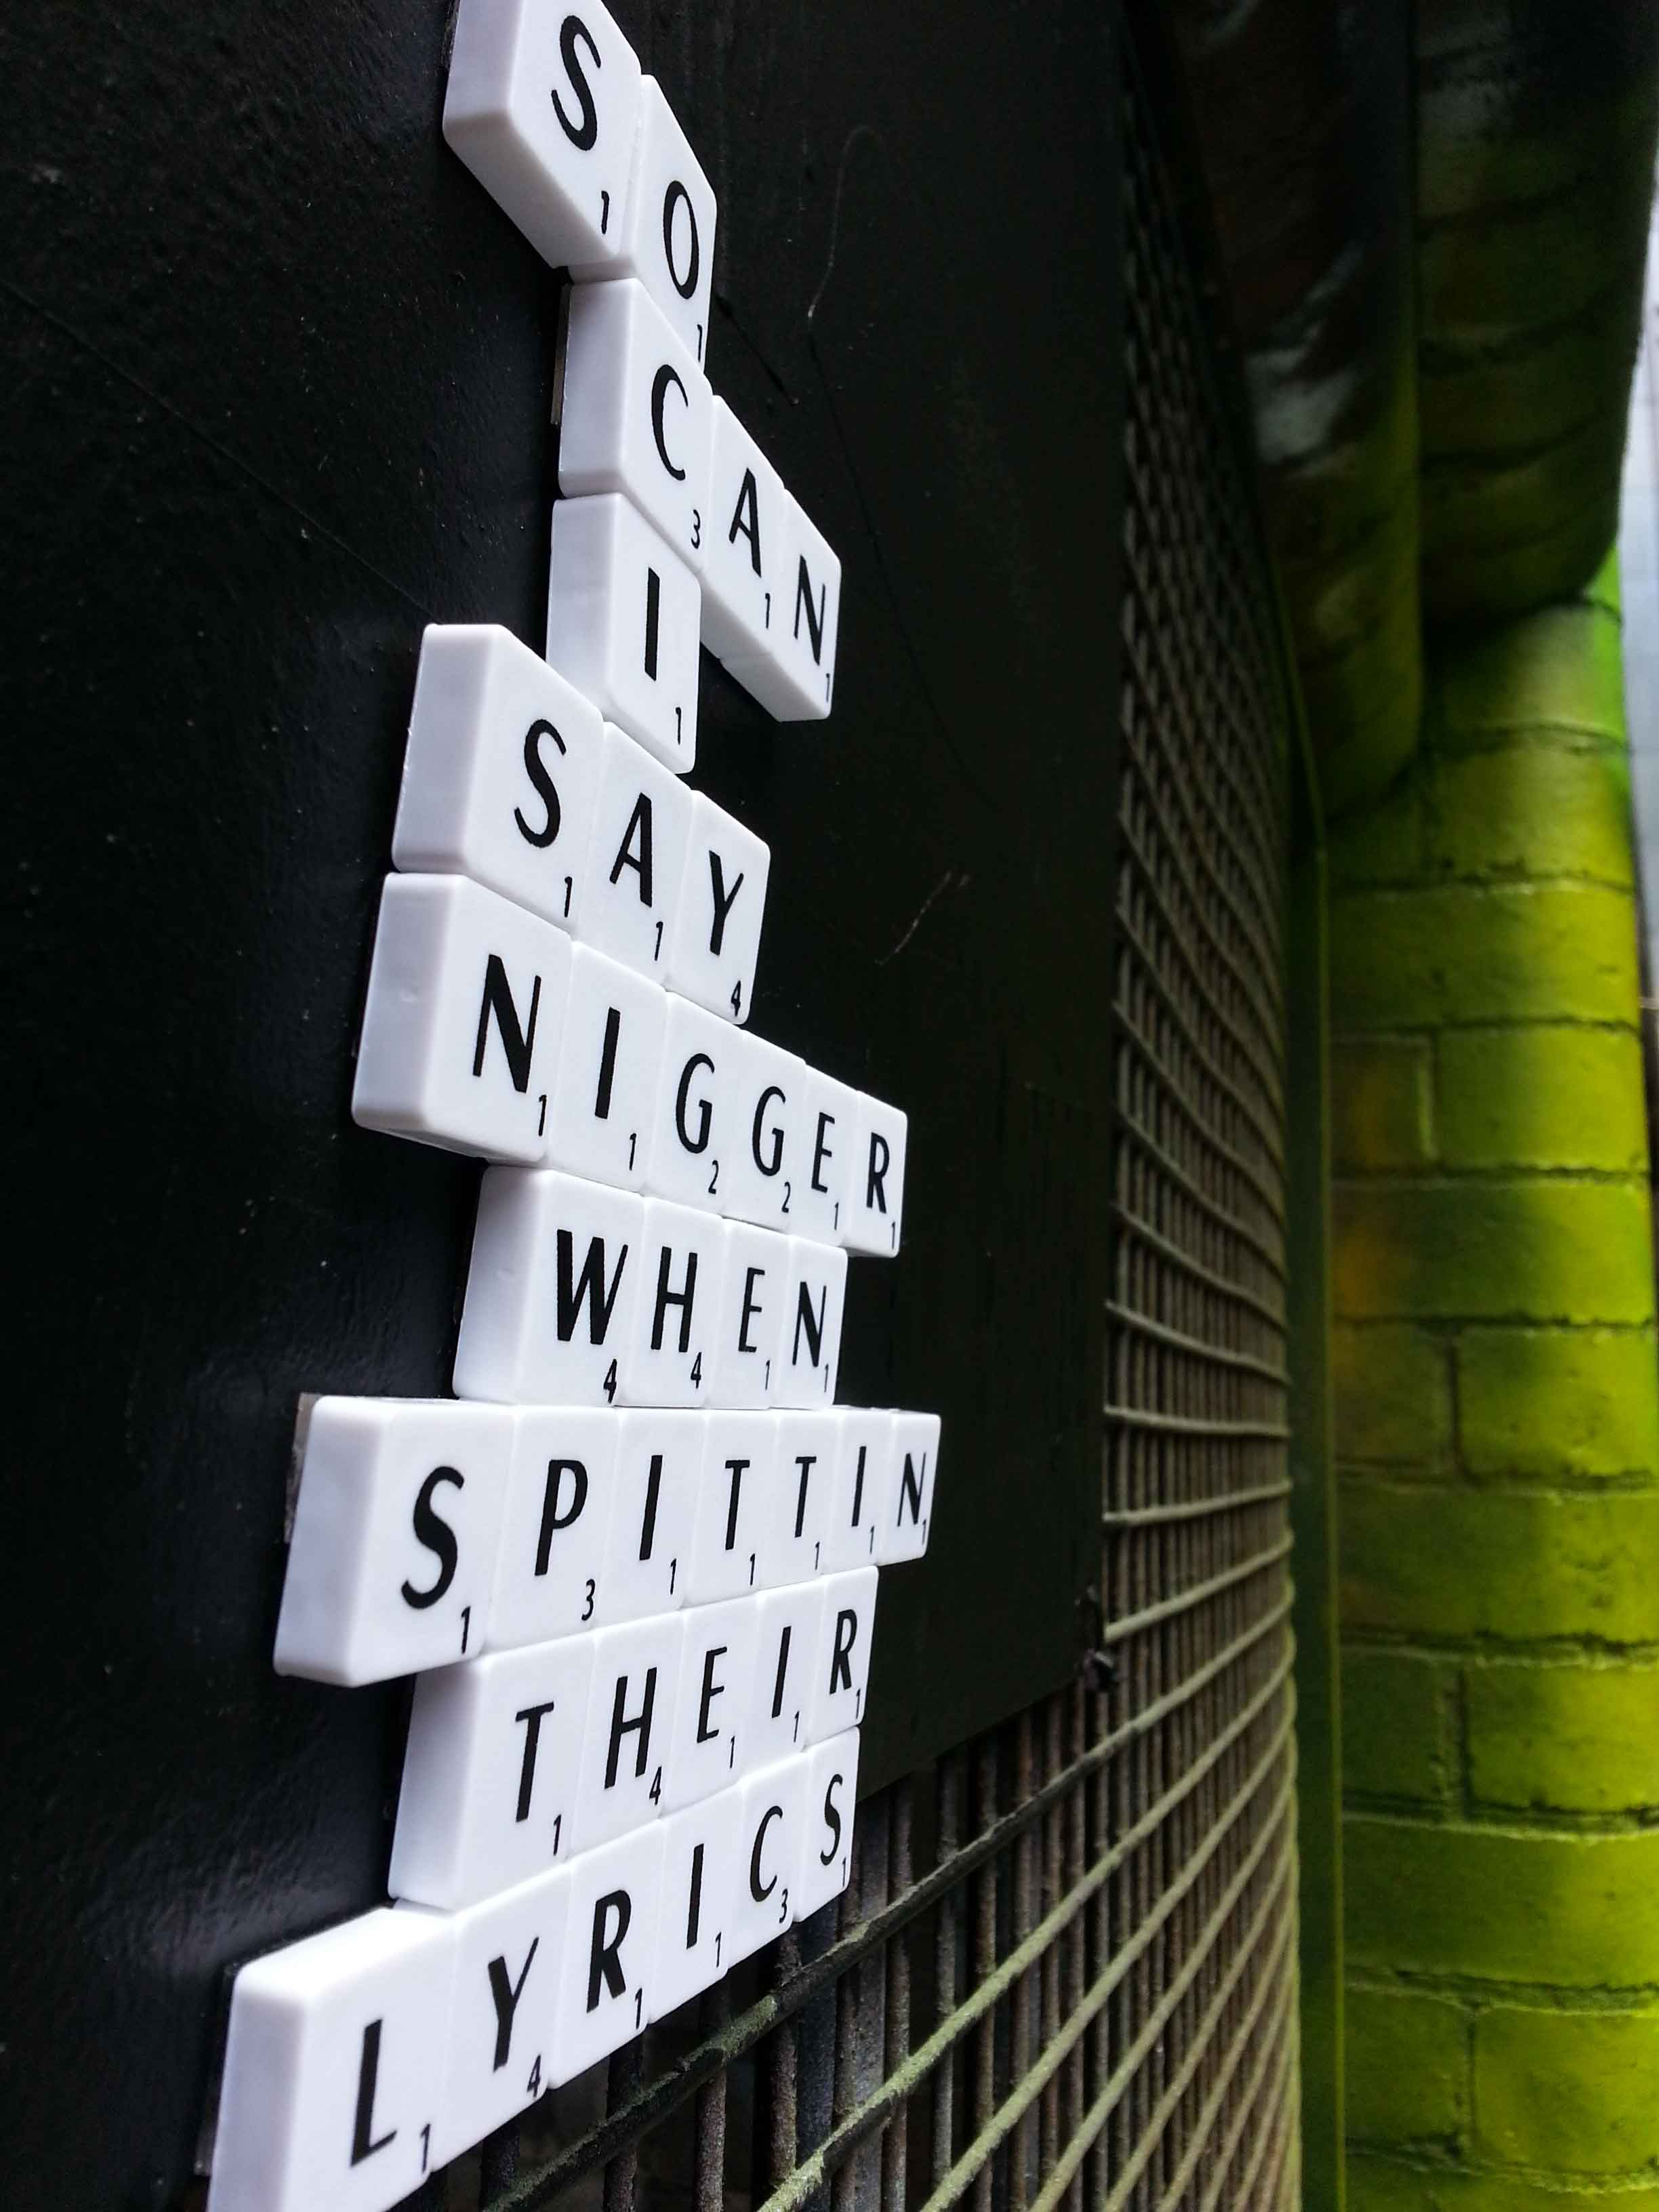 ScrabbleLit